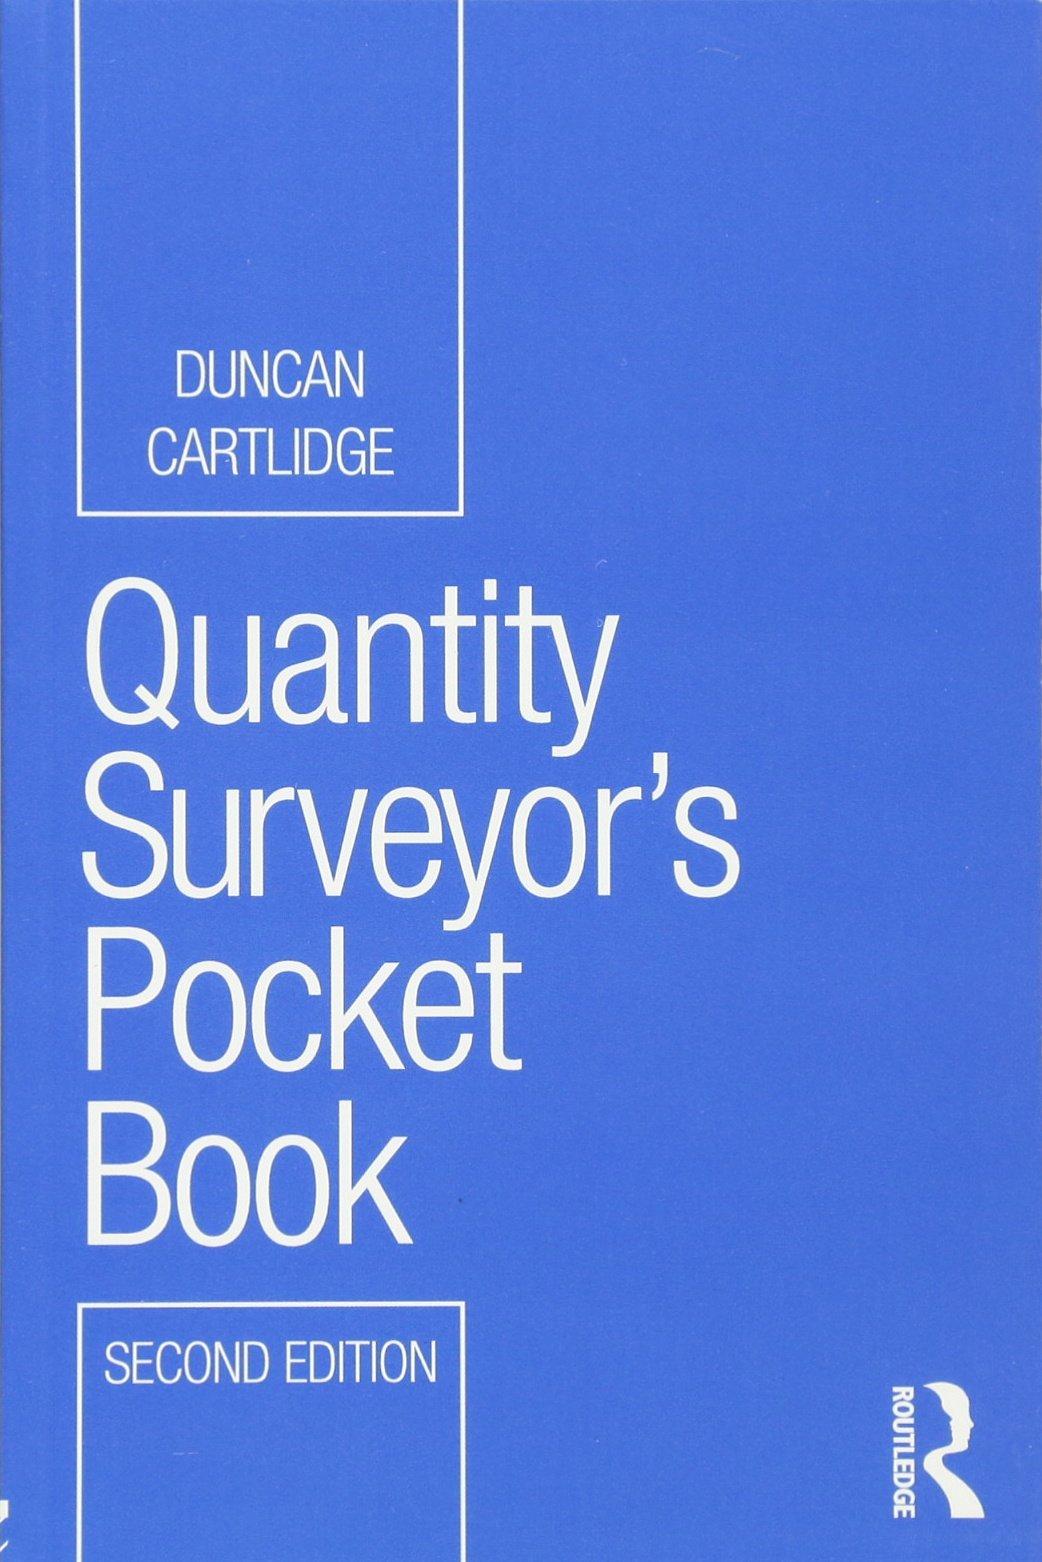 Quantity Surveyor's Pocket Book (routledge Pocket Books): Amazon:  Duncan Cartlidge: 8601300260020: Books